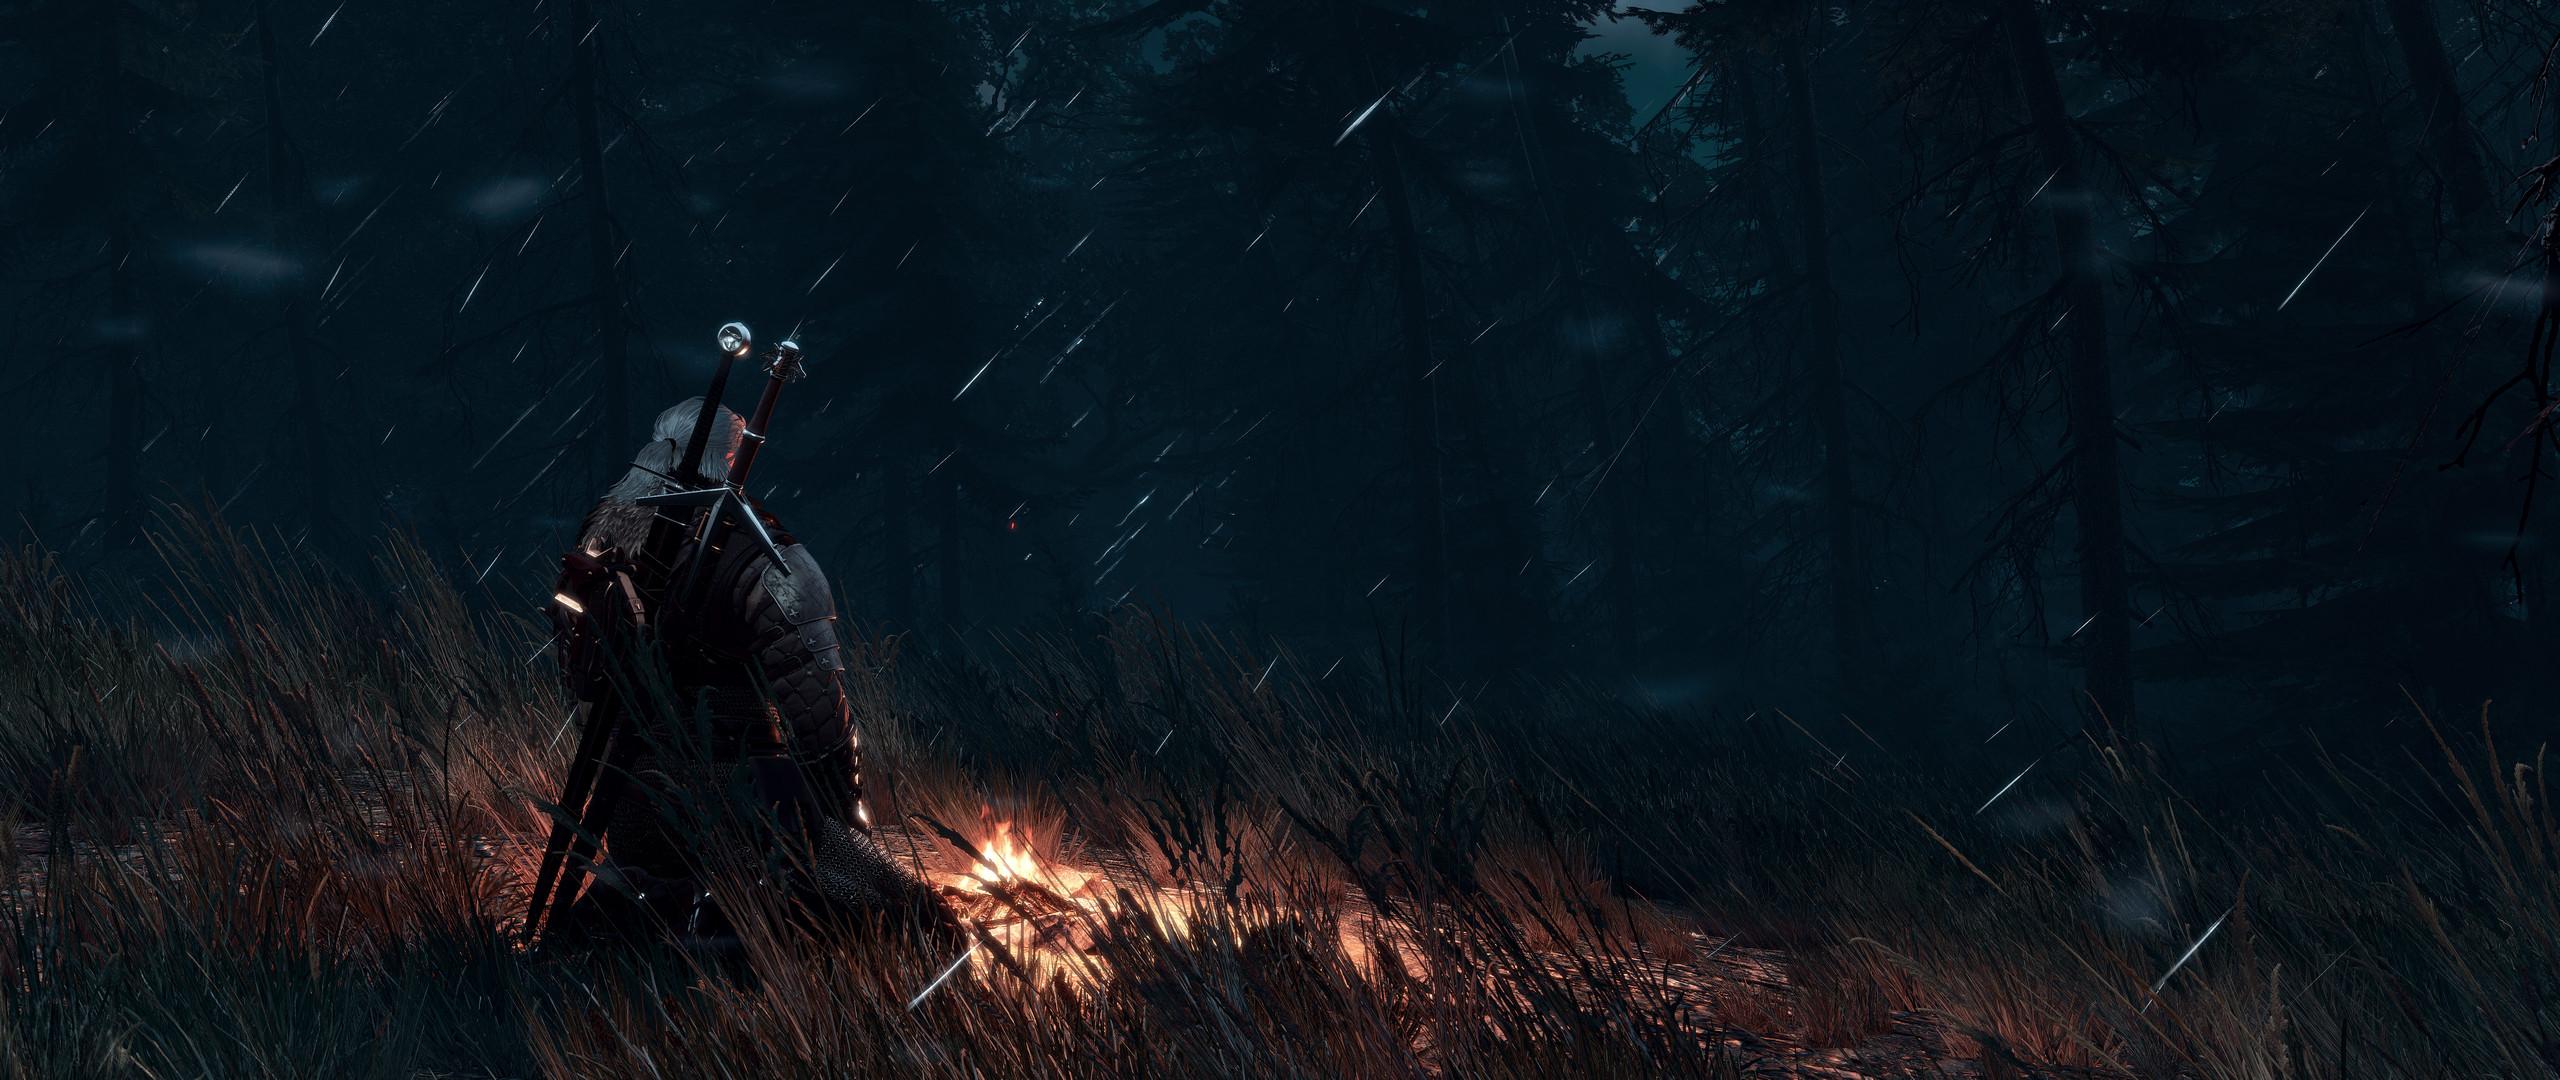 Res: 2560x1080, Computerspiele - The Witcher 3: Wild Hunt Feuer Bonfire Meditation Night  Geralt of Rivia Wallpaper